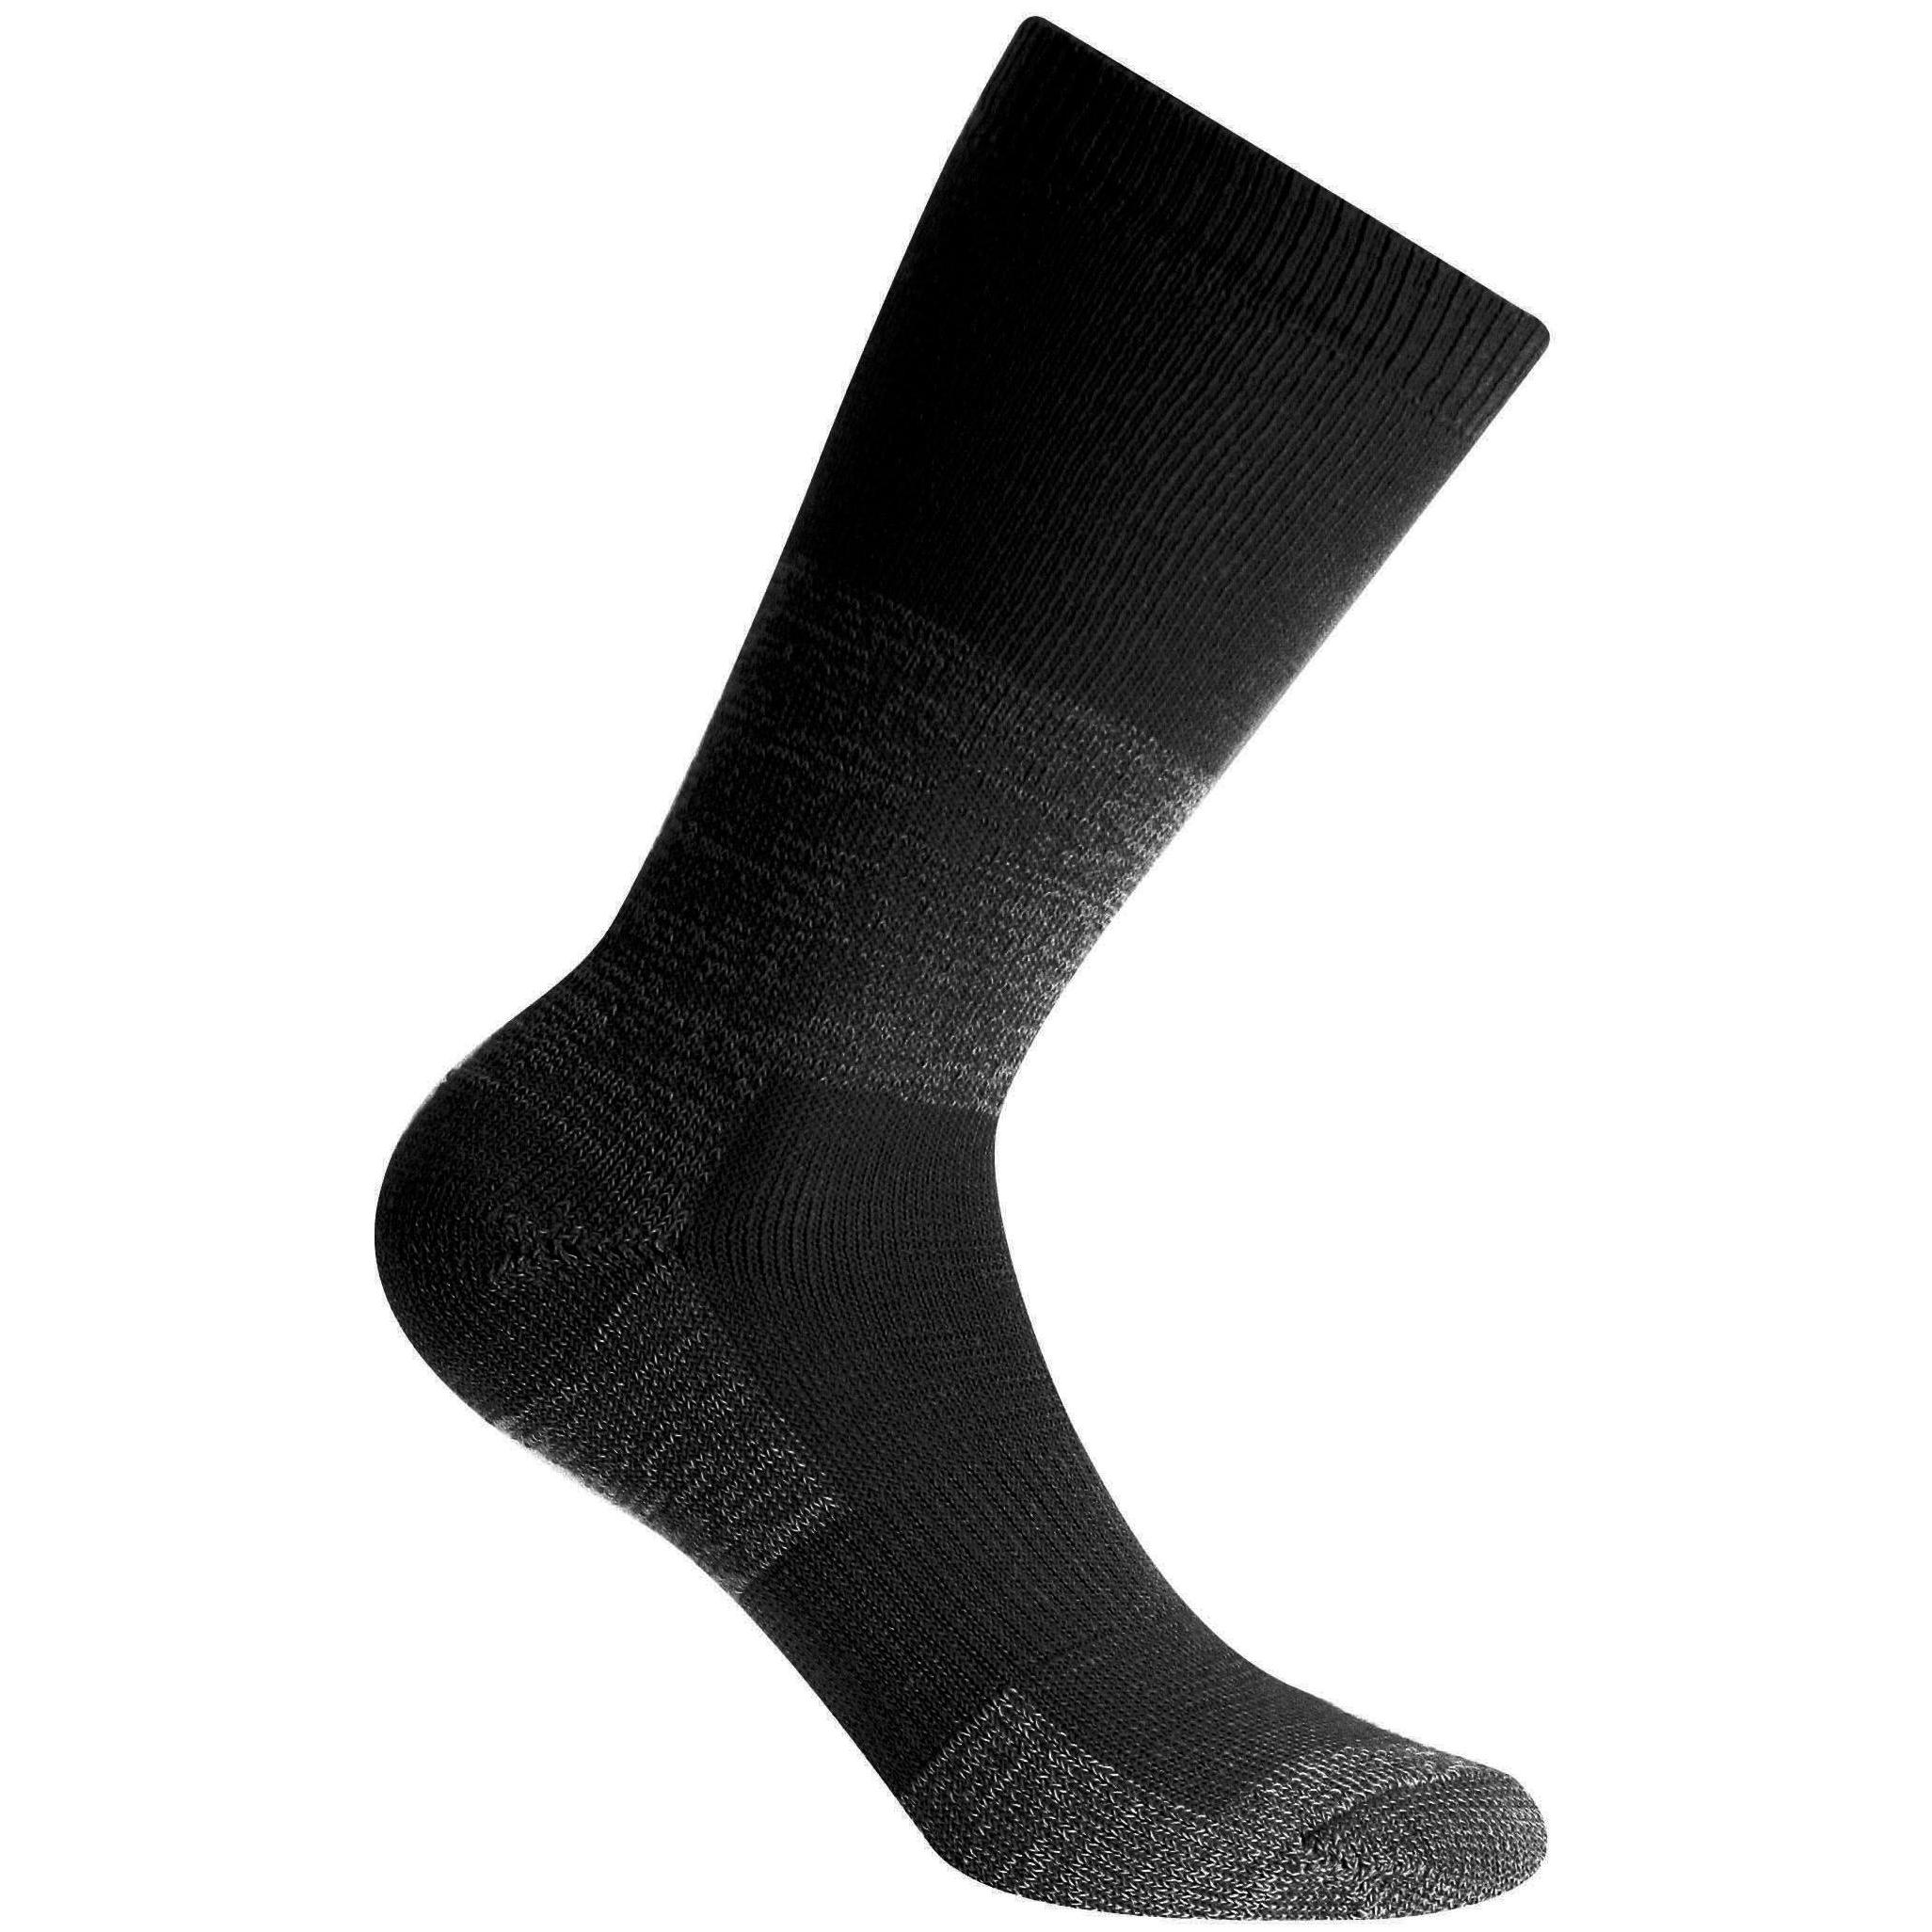 Носки Accapi Socks Trekking Merino Hydro-R, black, 39-41 EU